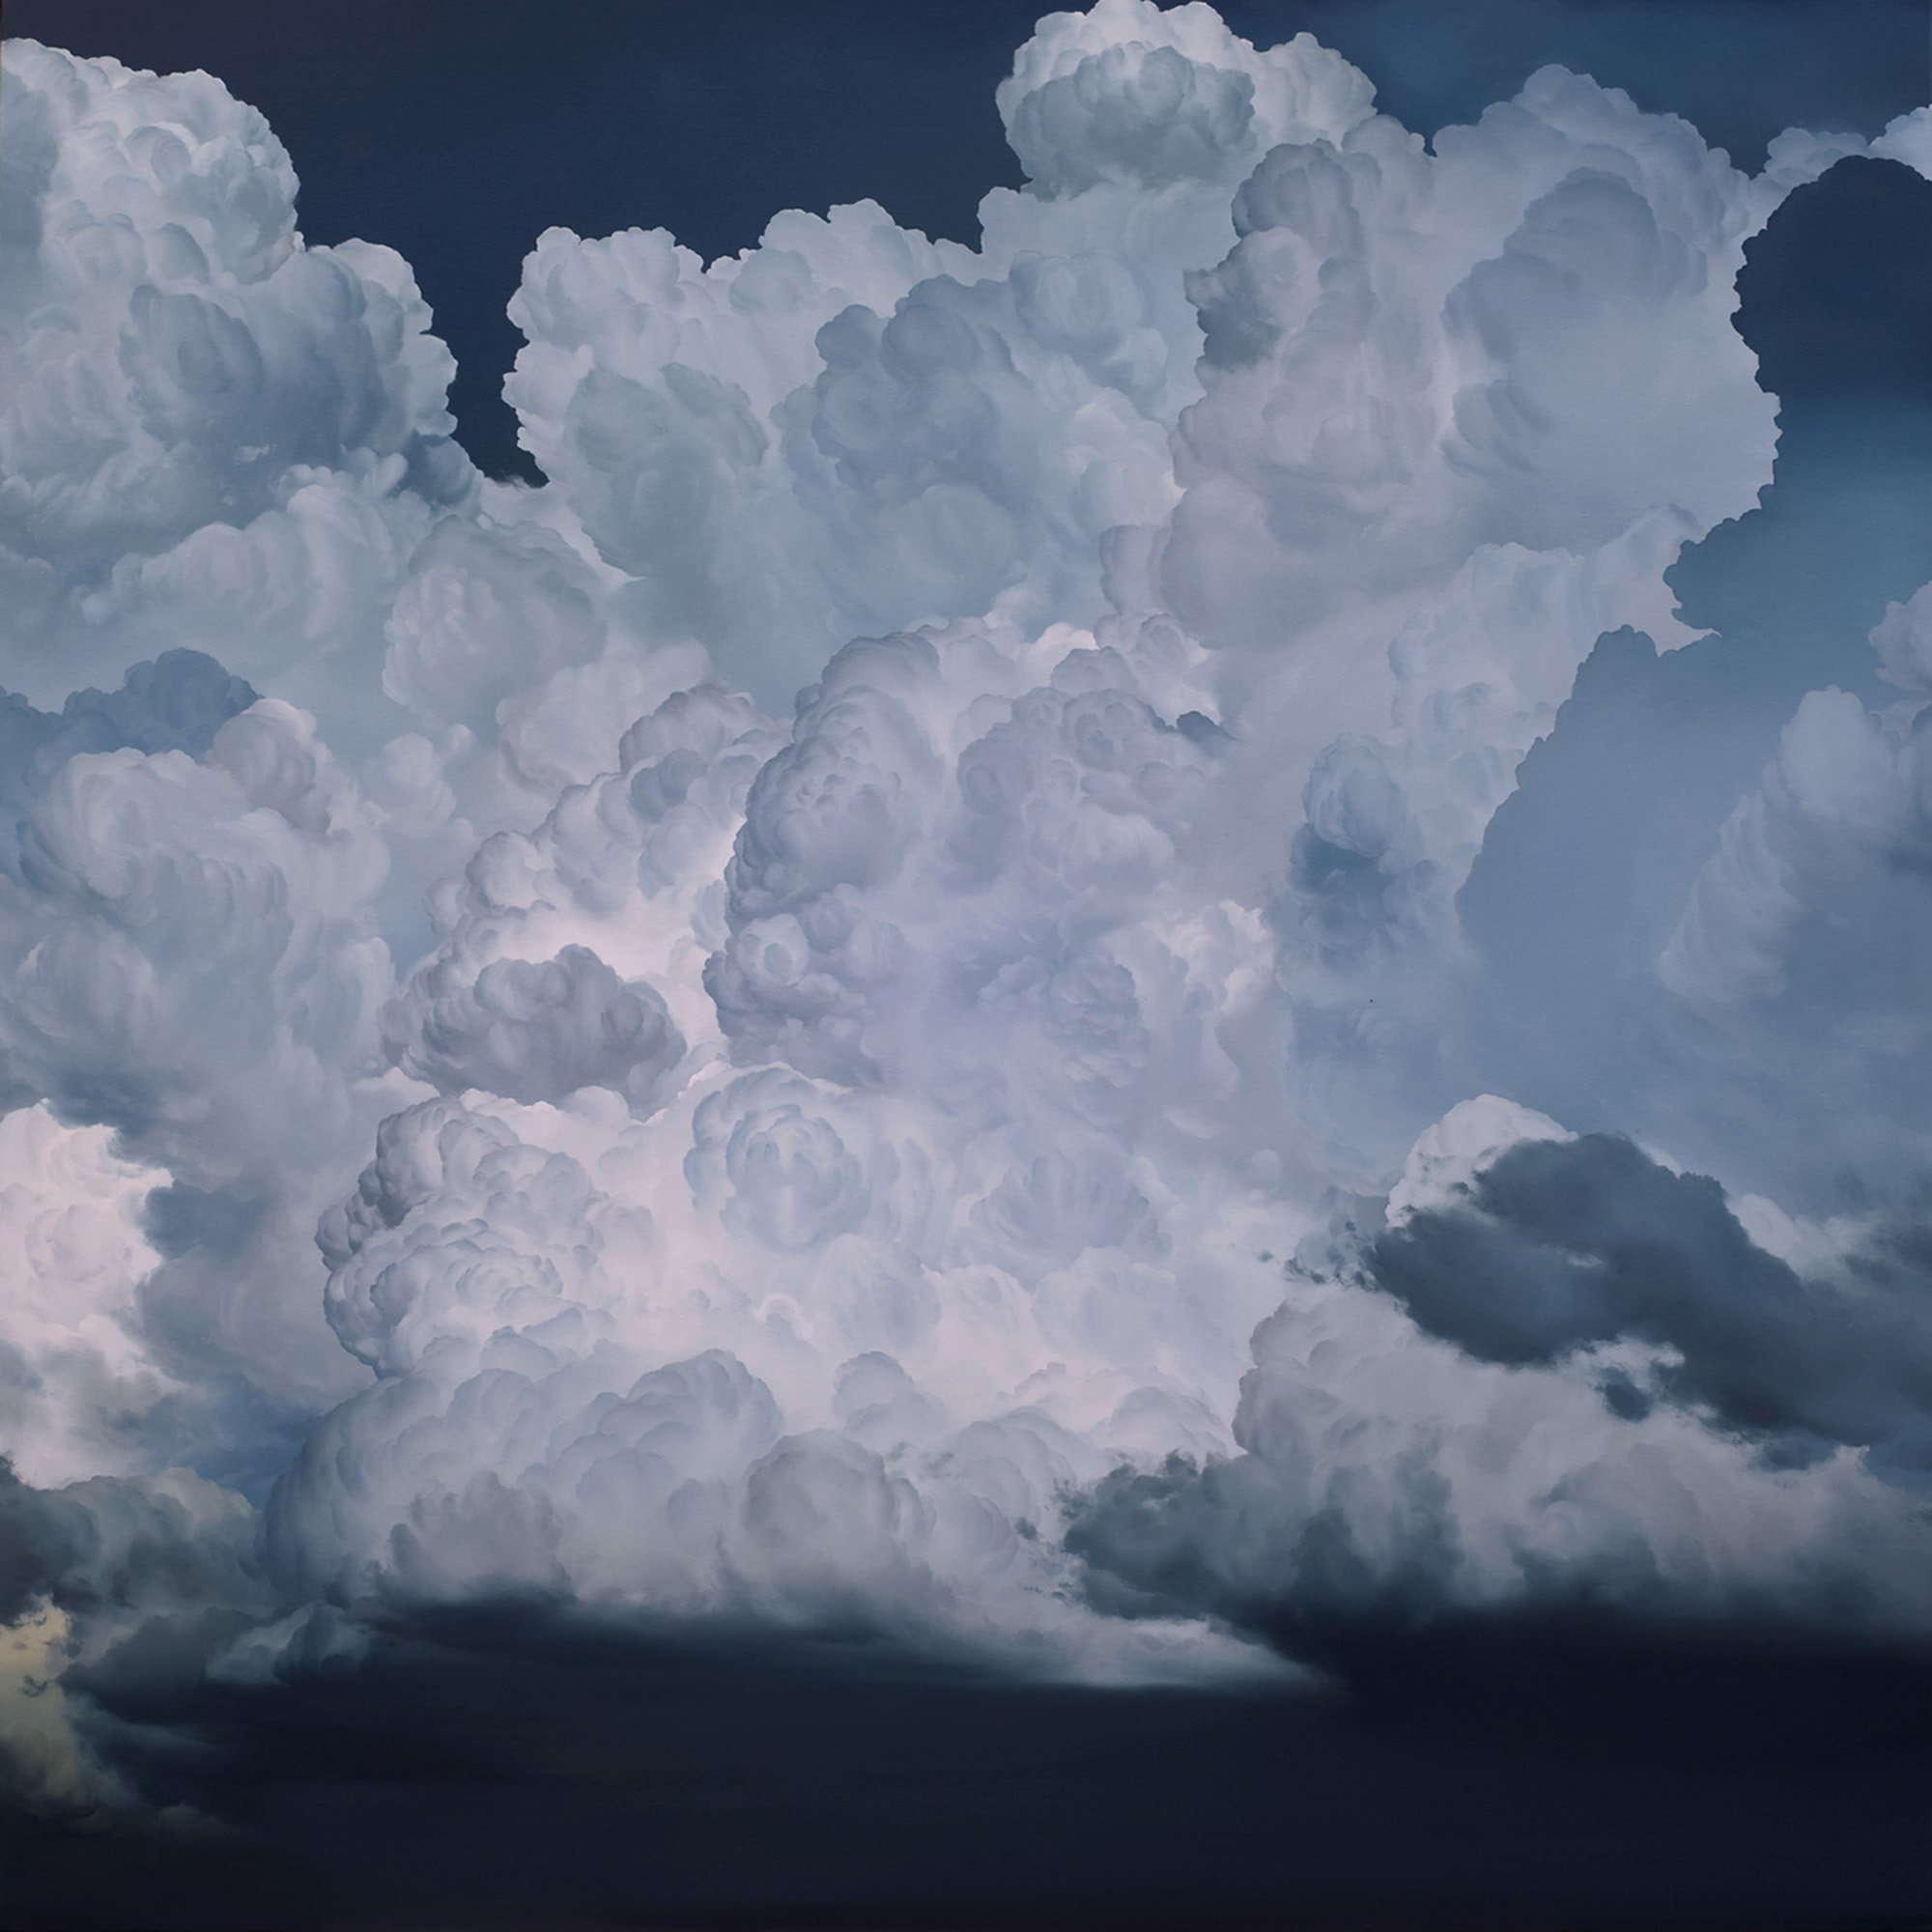 ian-fisher-cloud-paintings-3.jpg